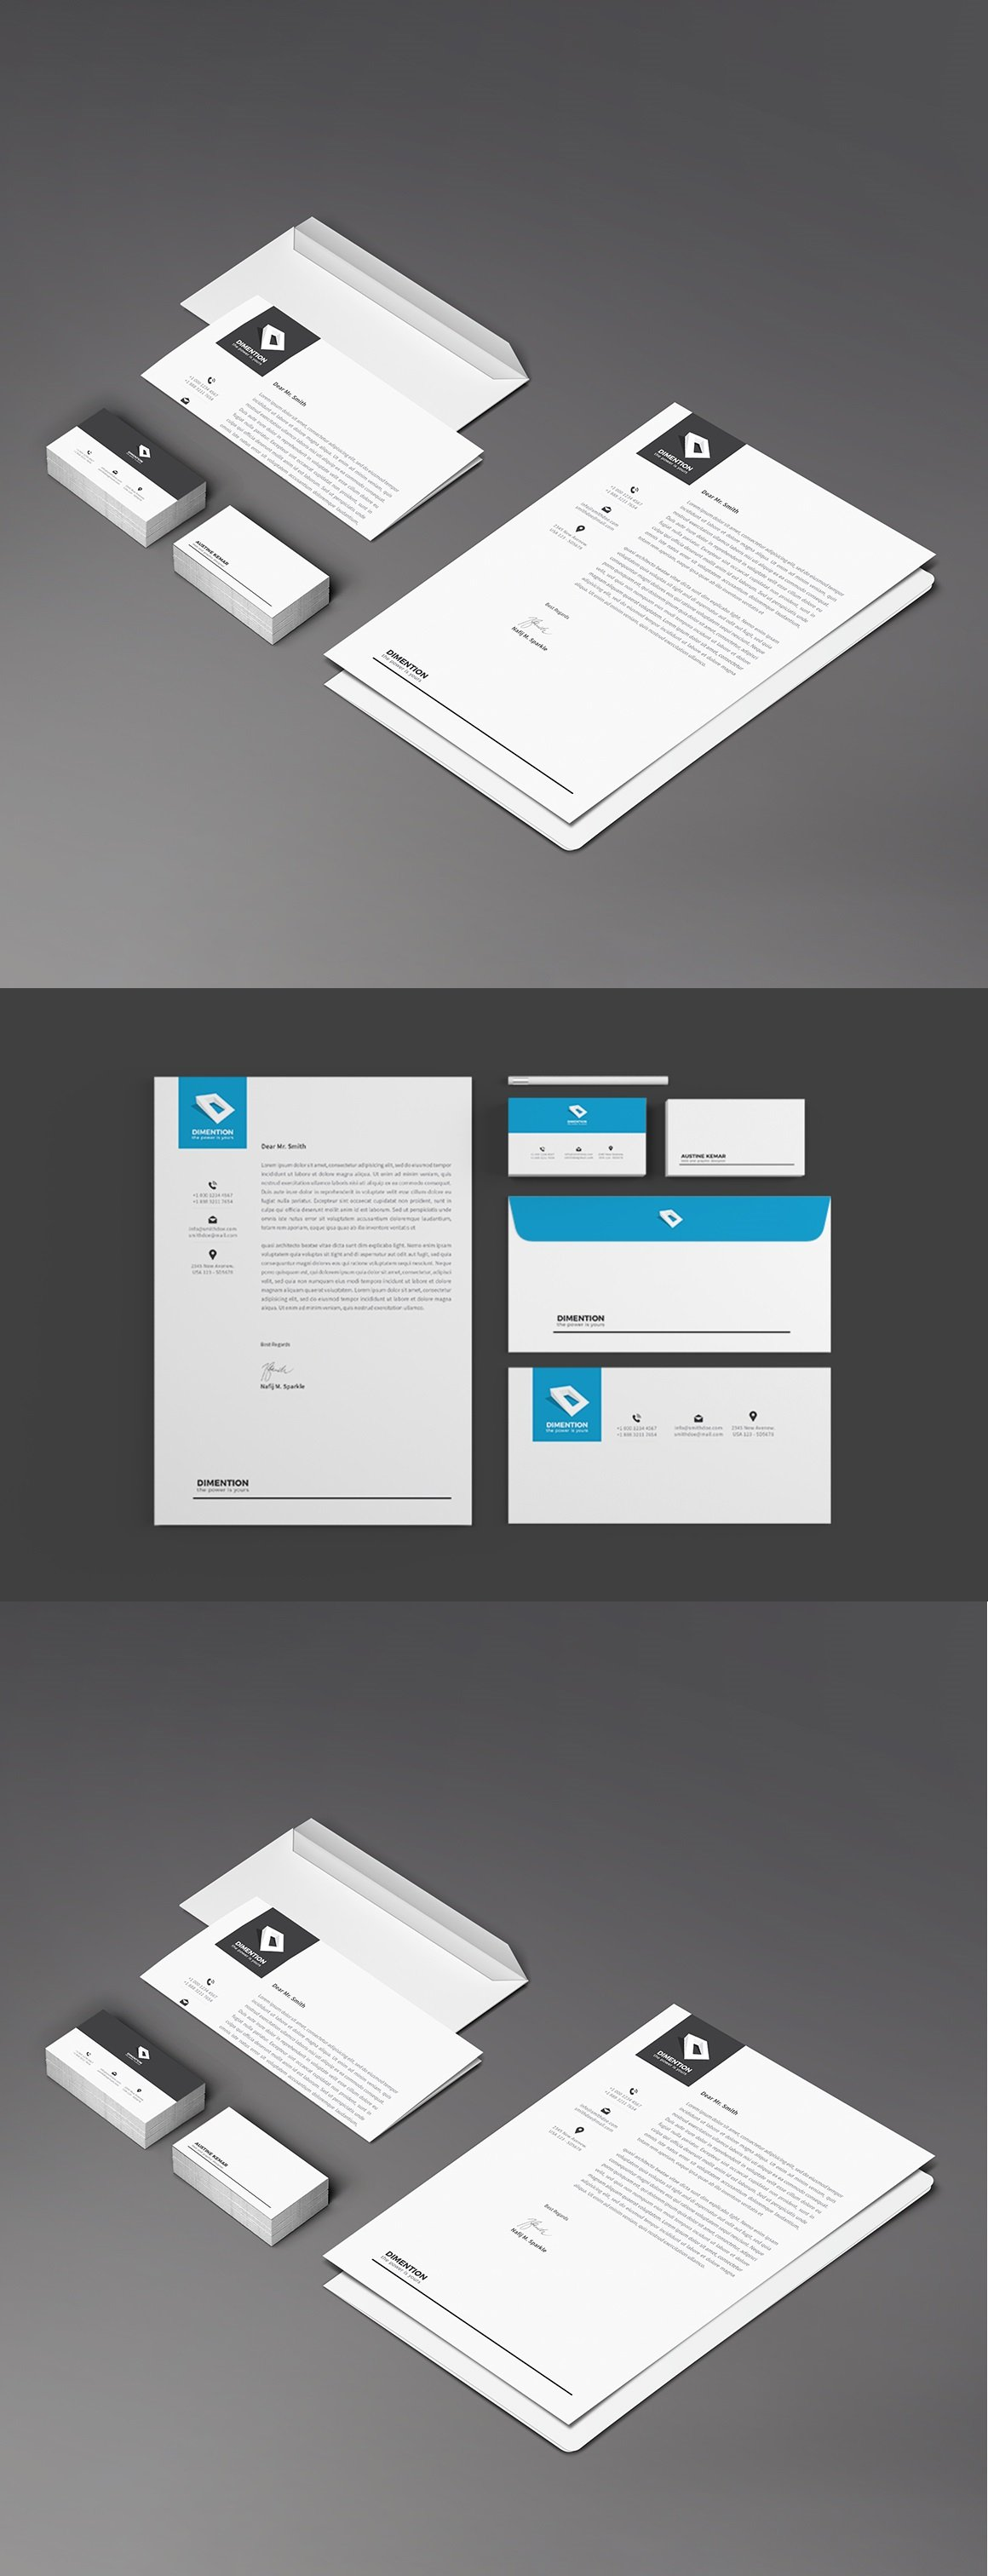 Multipurpose Corporate Identity Template - screenshot